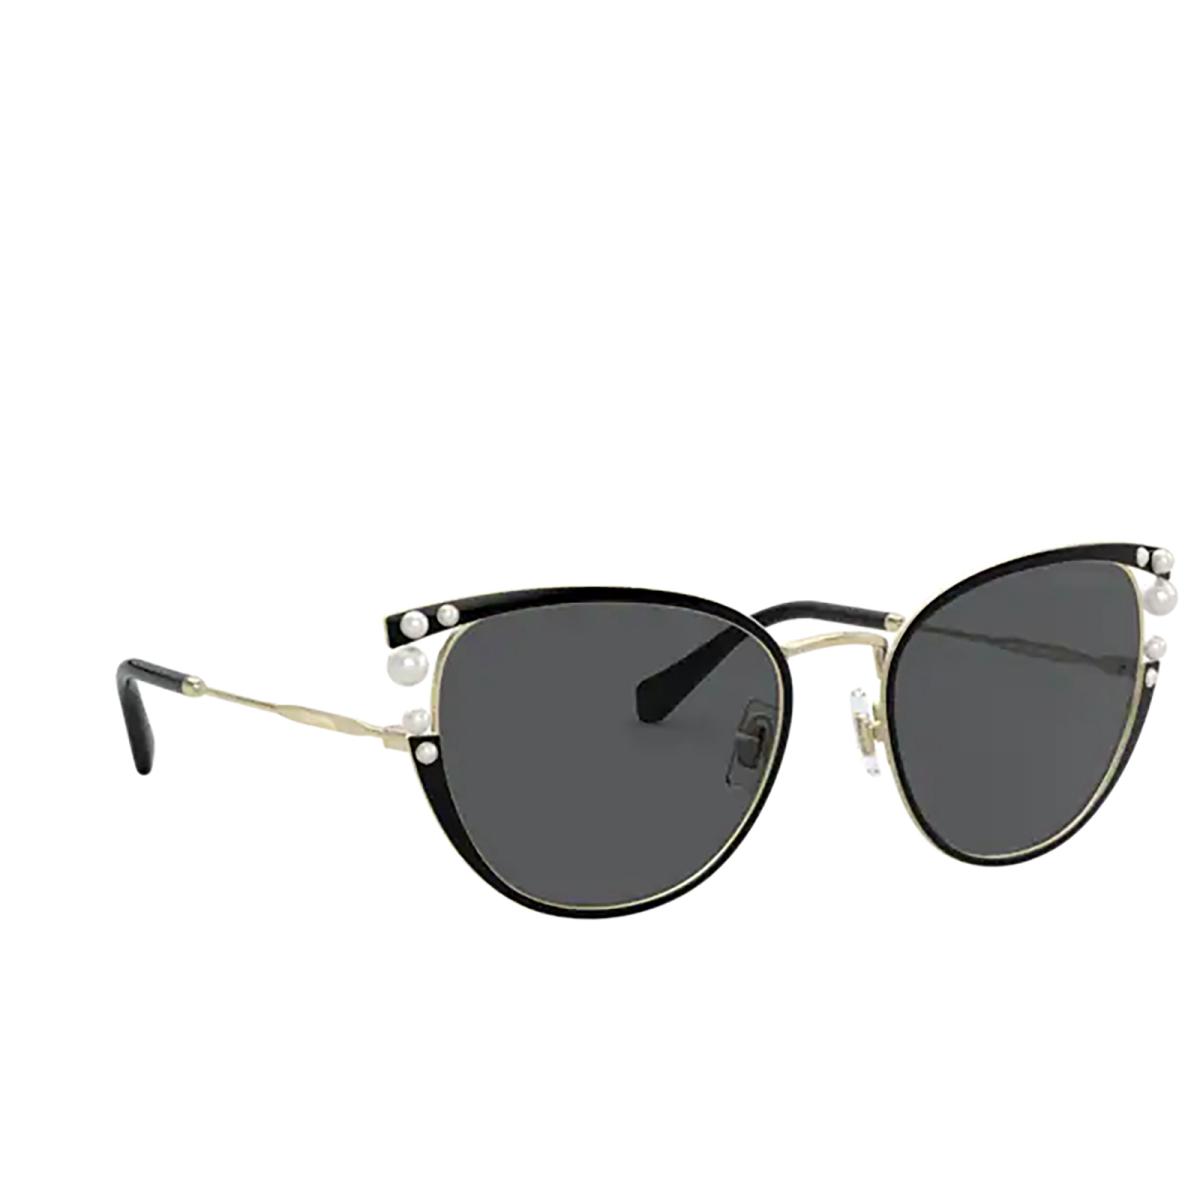 Miu Miu® Cat-eye Sunglasses: Core Collection MU 62VS color Black AAV5S0.